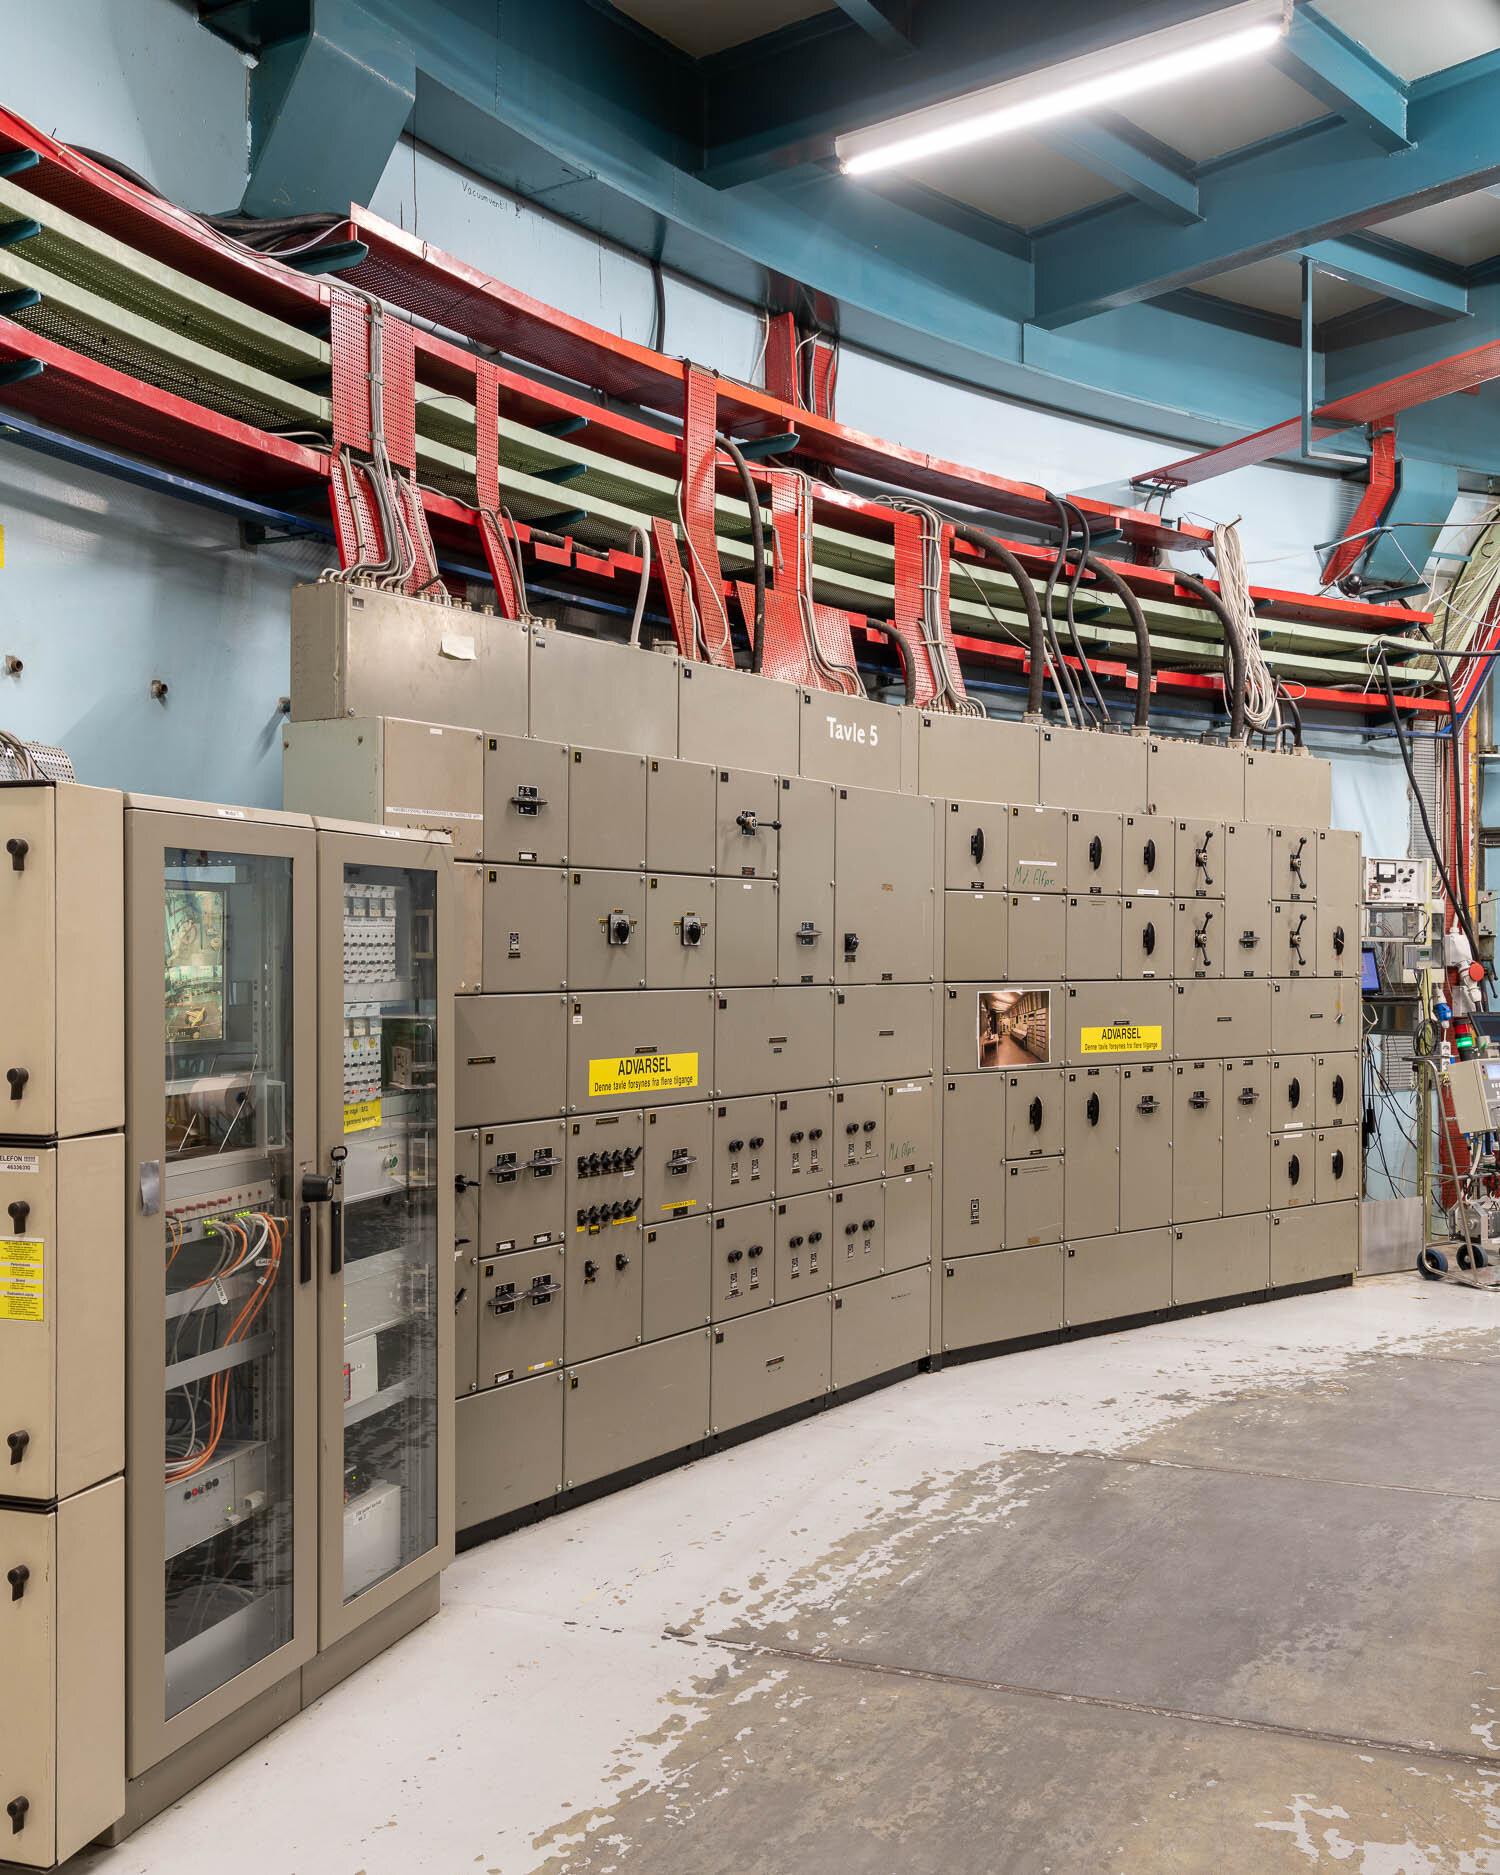 Decommissioning Dansk Reactor 3